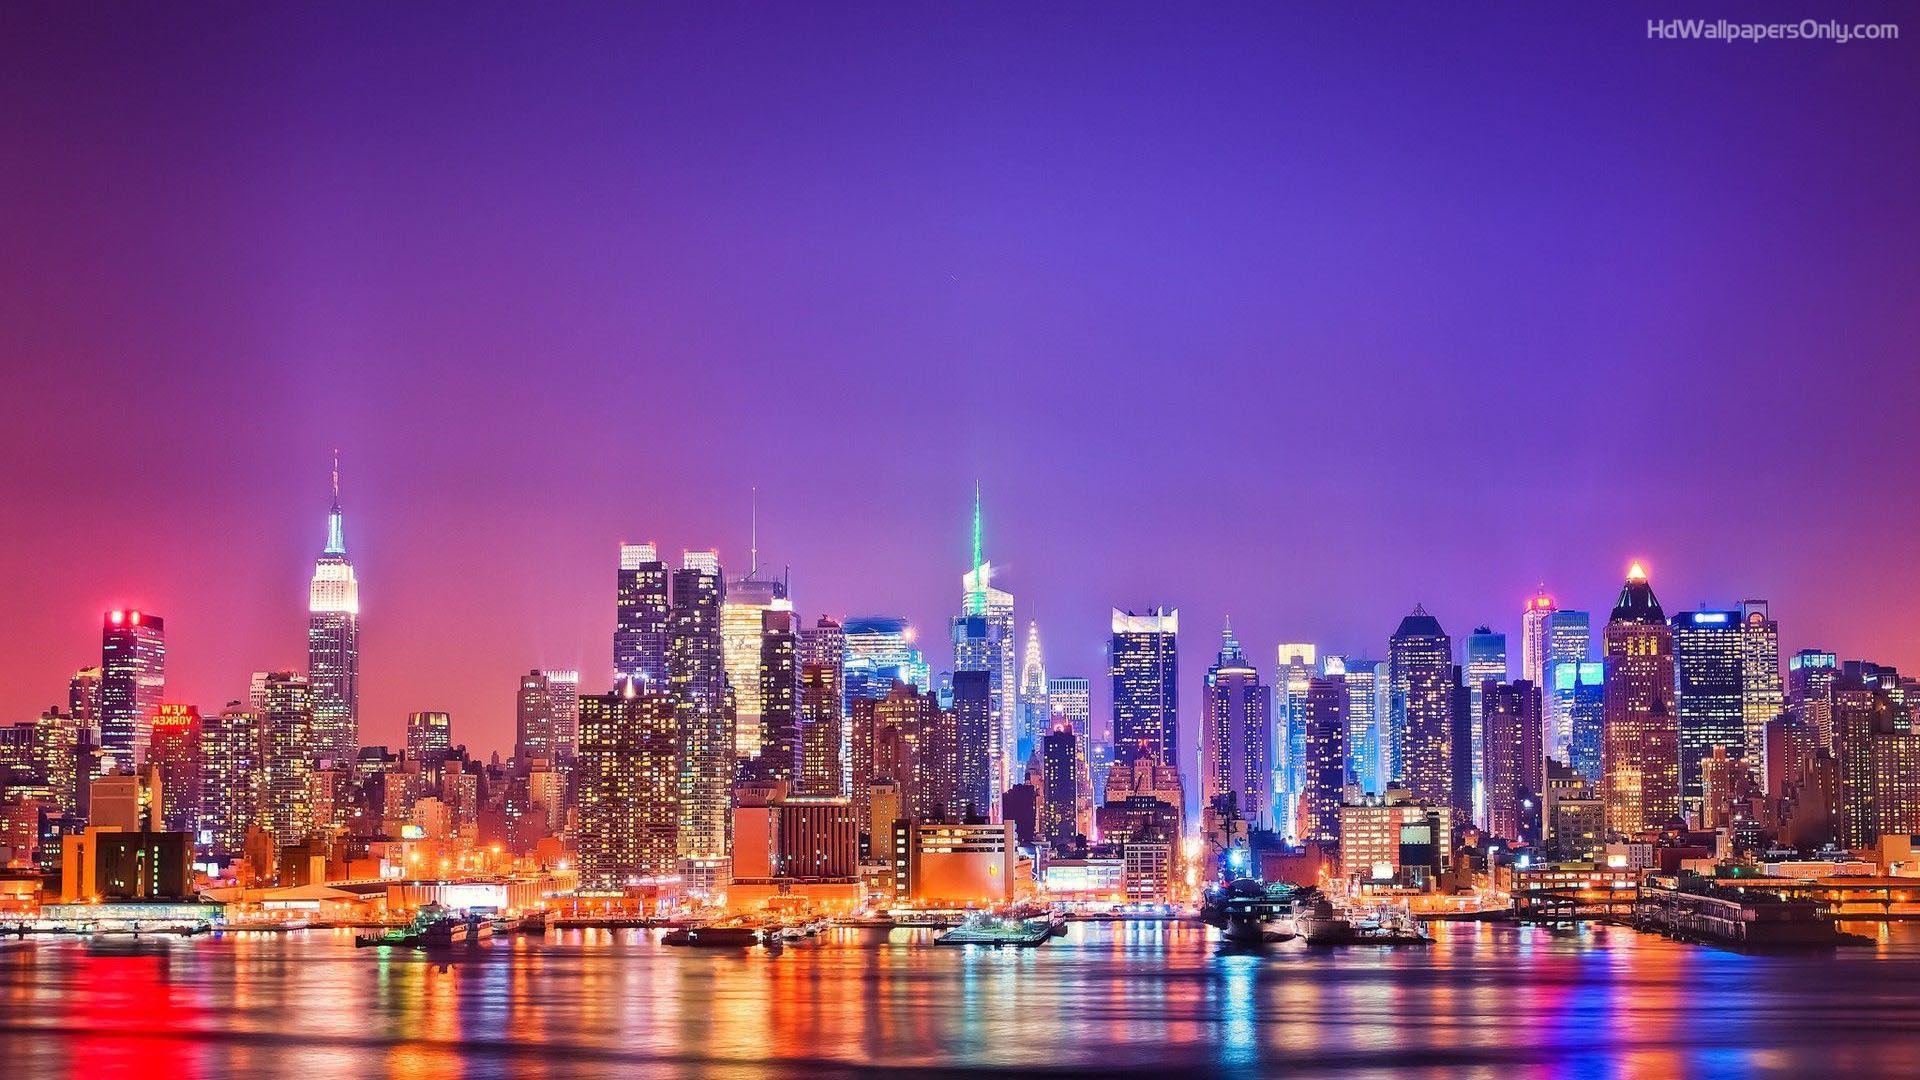 Un jour jirai New York avec toi SWAG DAY 1920x1080